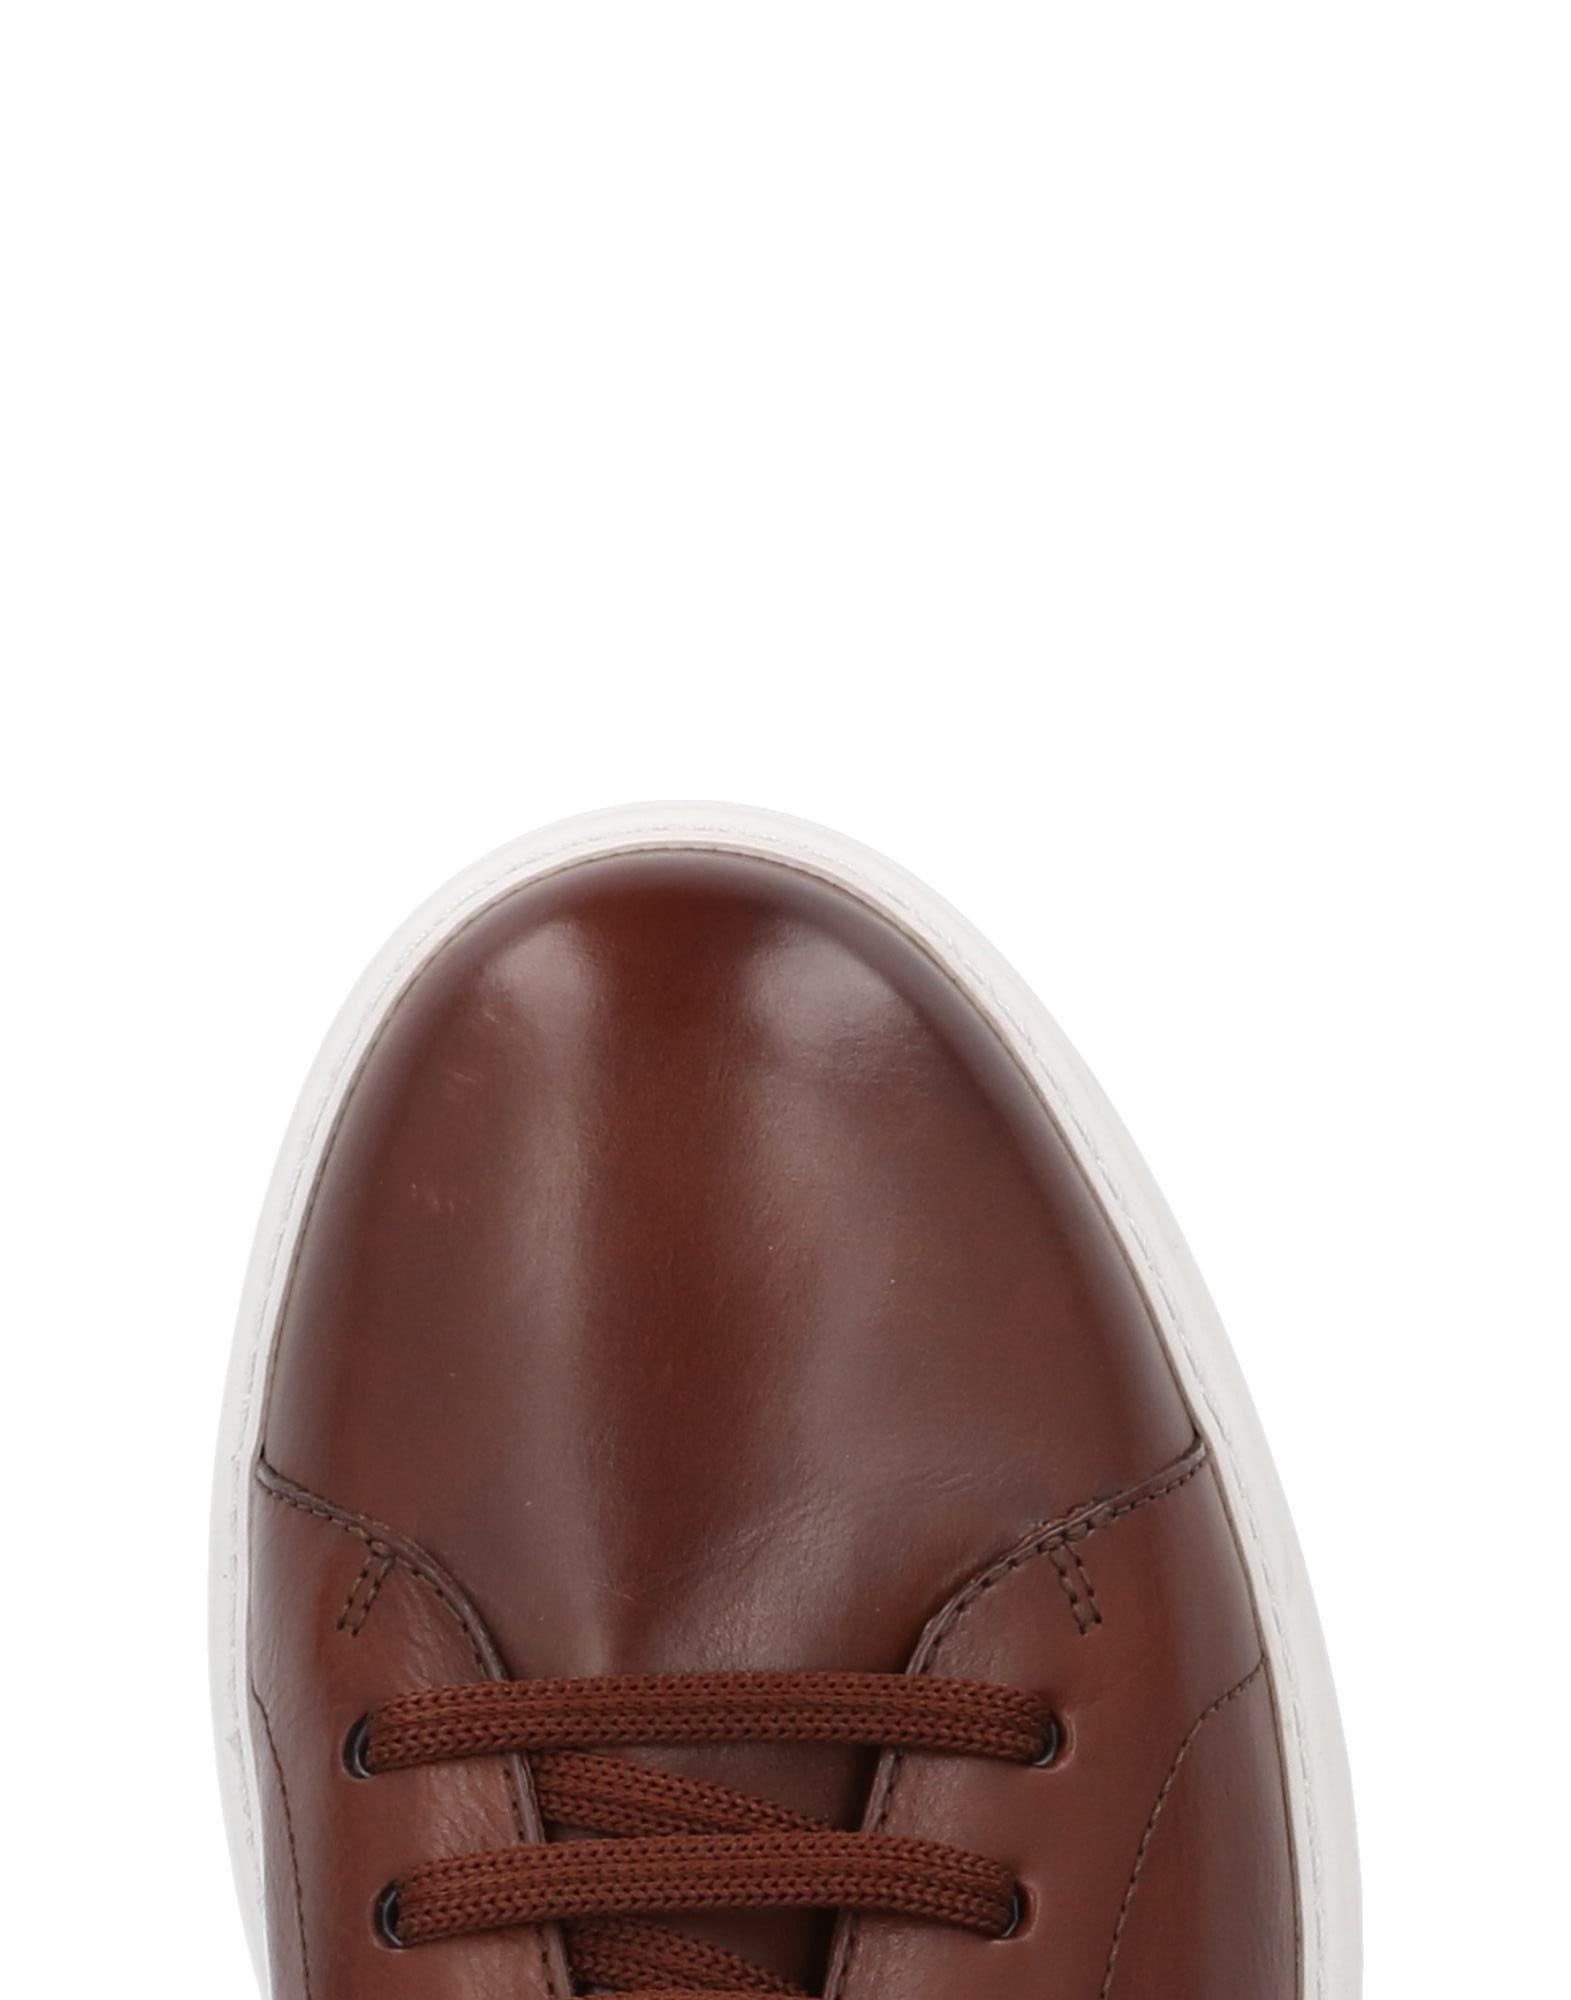 Salvatore Ferragamo Sneakers Herren  11465863WU Gute Gute Gute Qualität beliebte Schuhe 3b34be